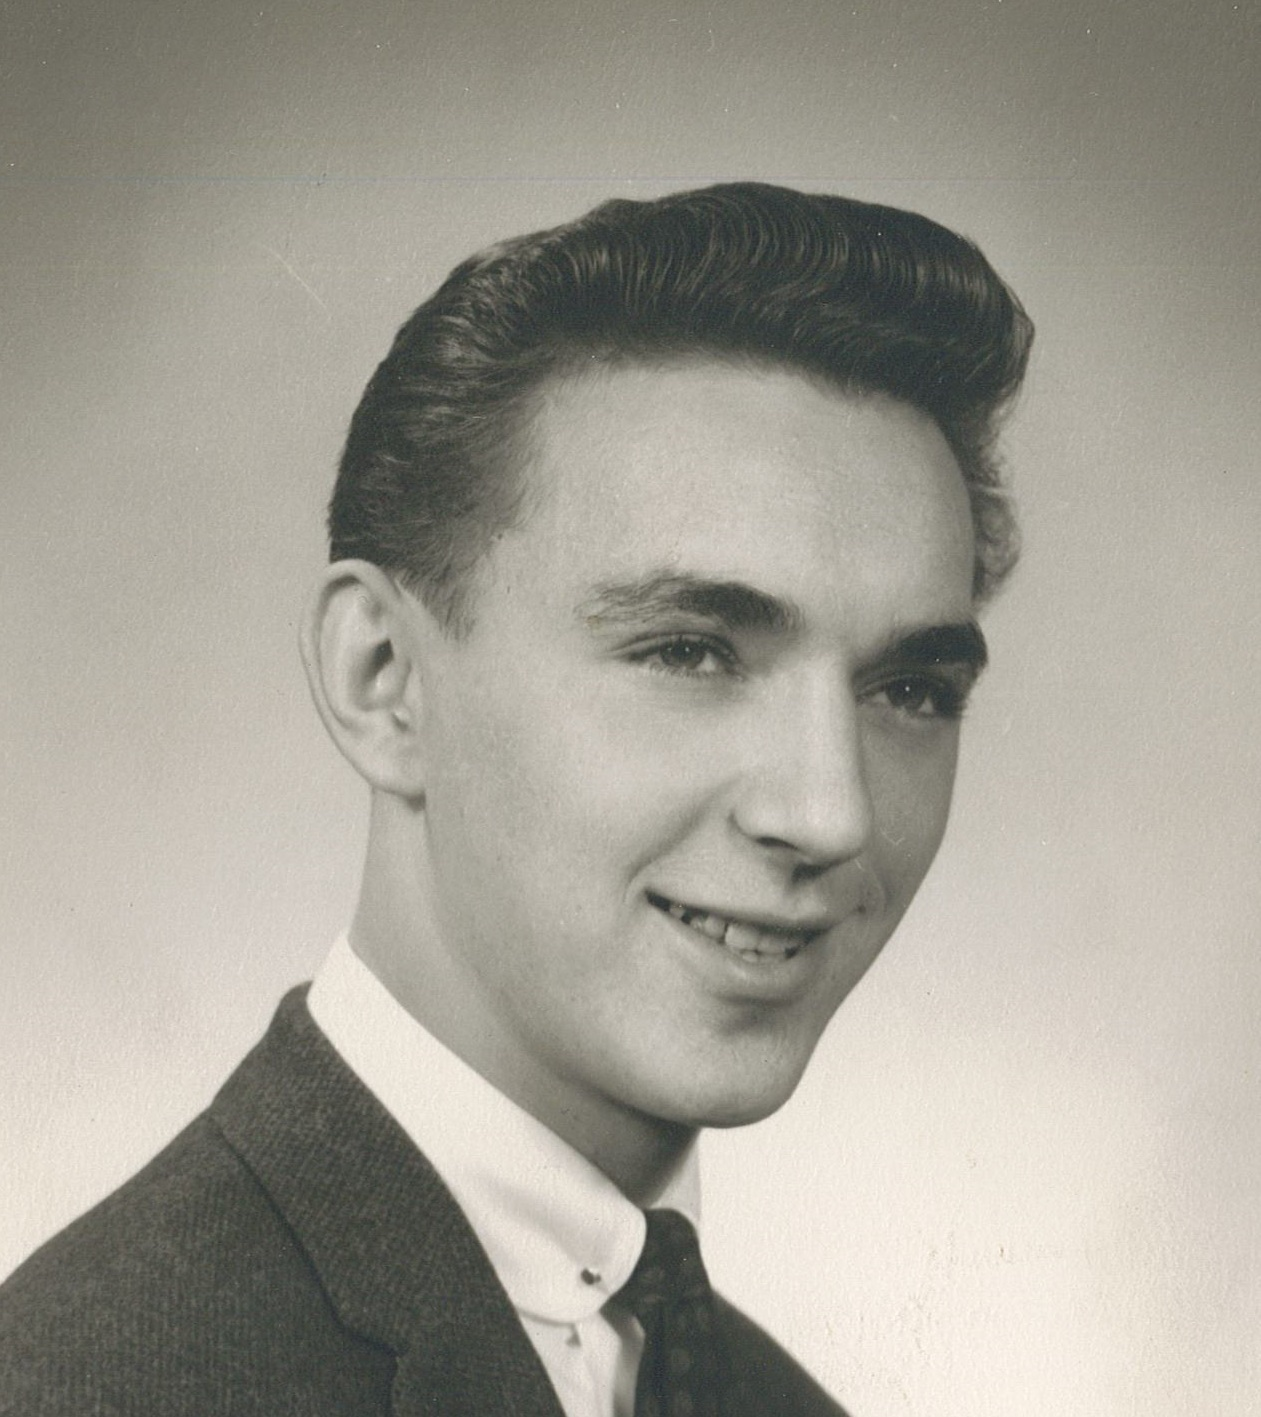 John J. Locher